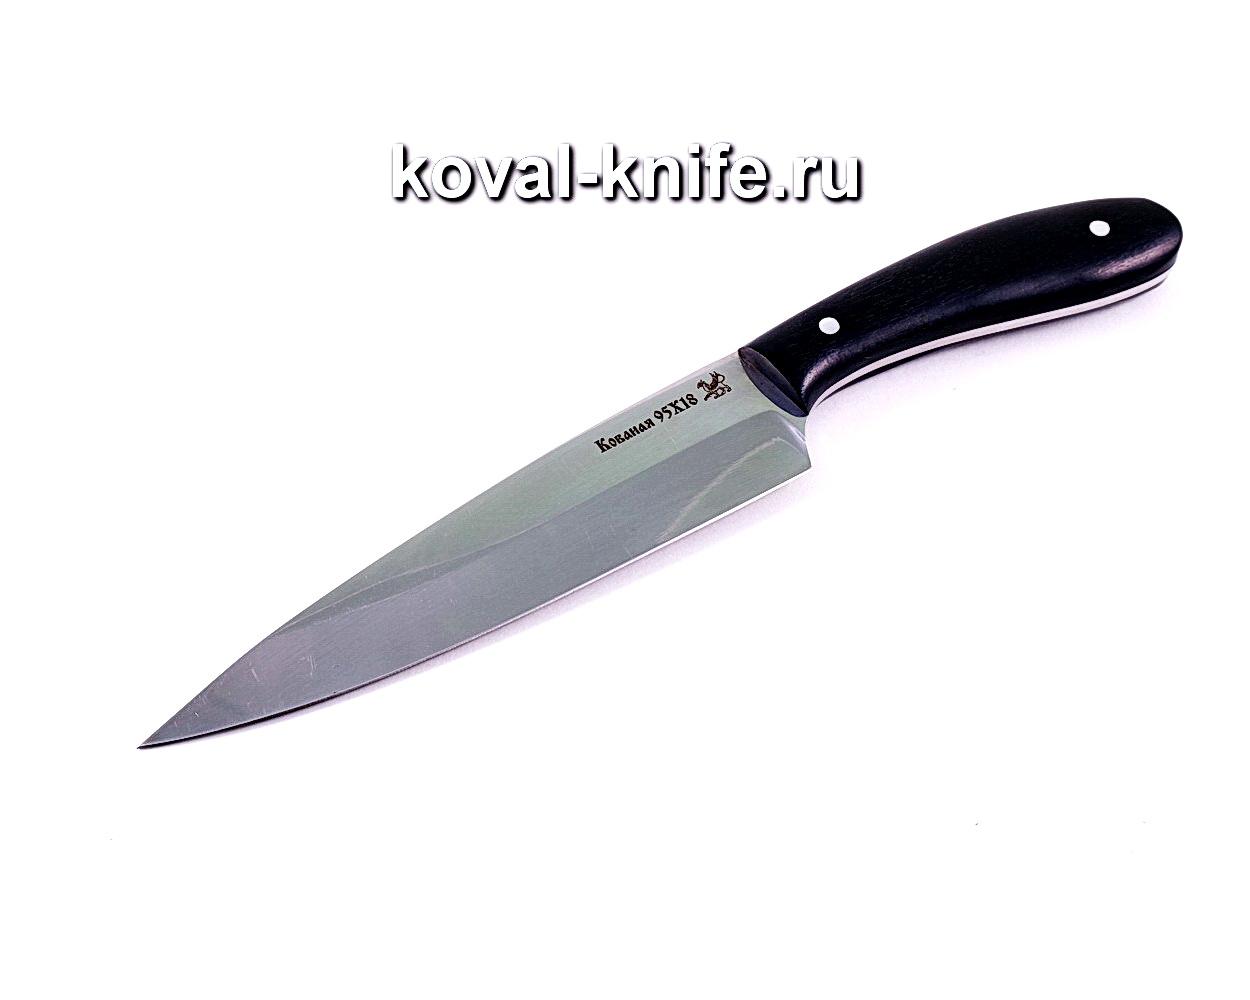 Кухонный средний нож (сталь 95х18), рукоять граб A134